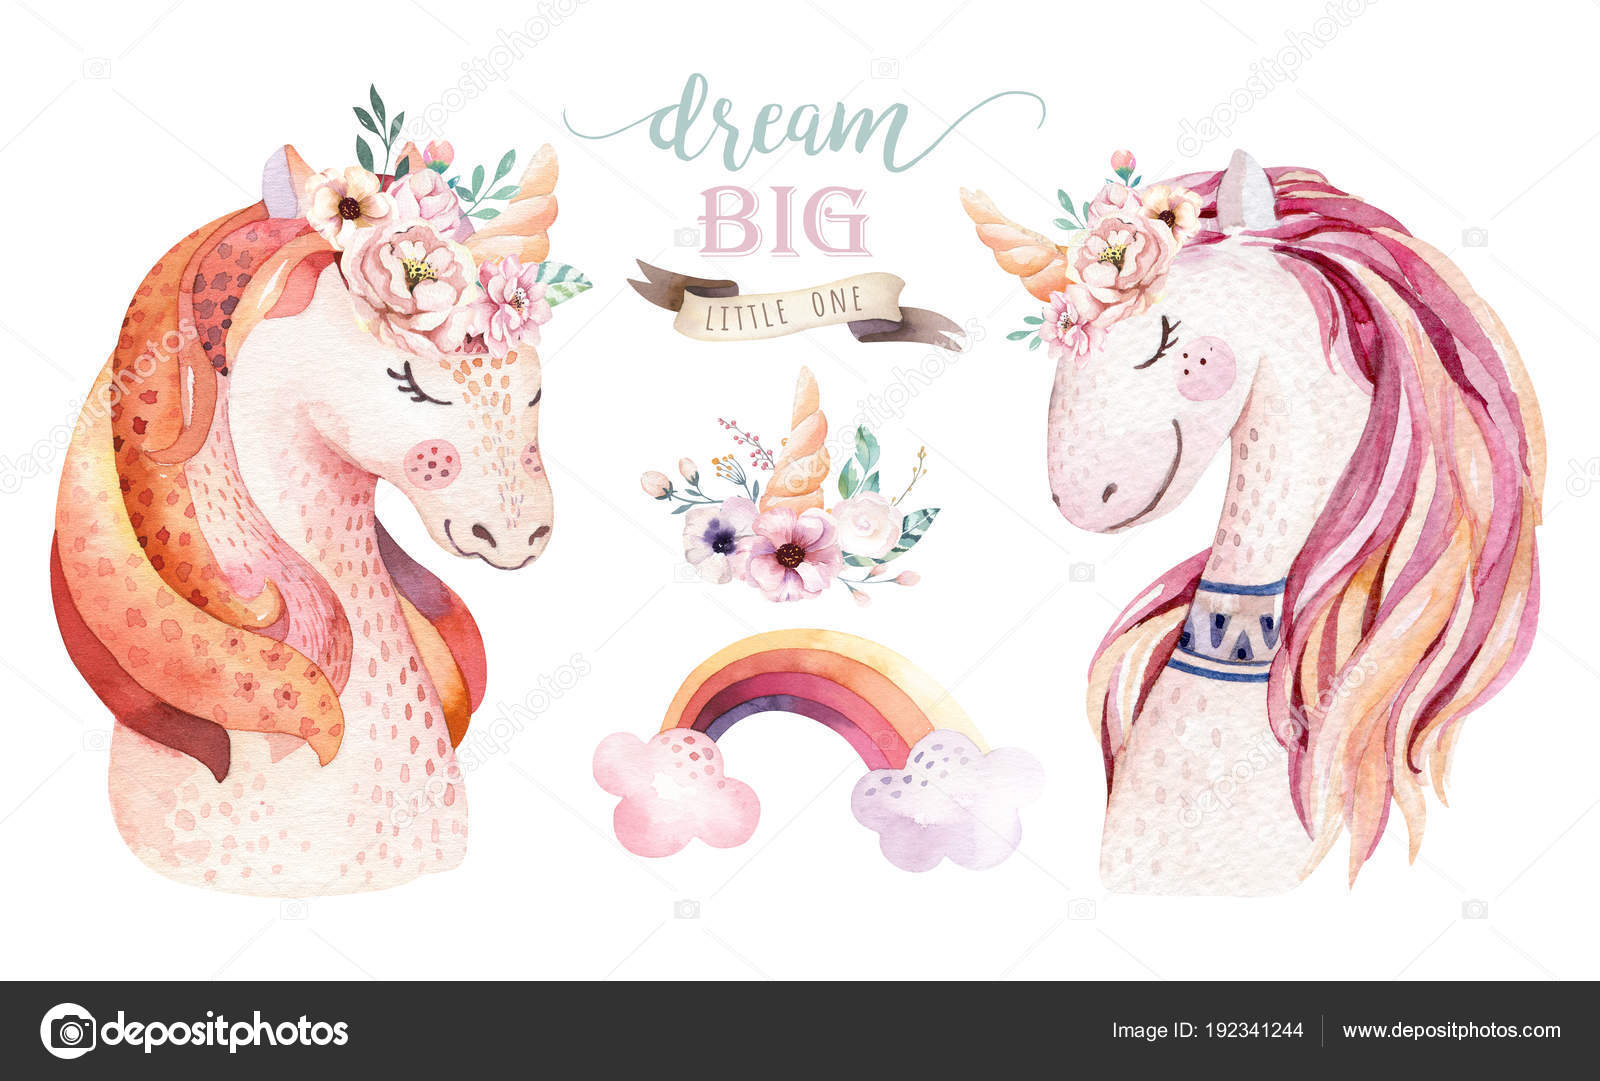 Cute pony clip art | Isolated cute watercolor unicorn